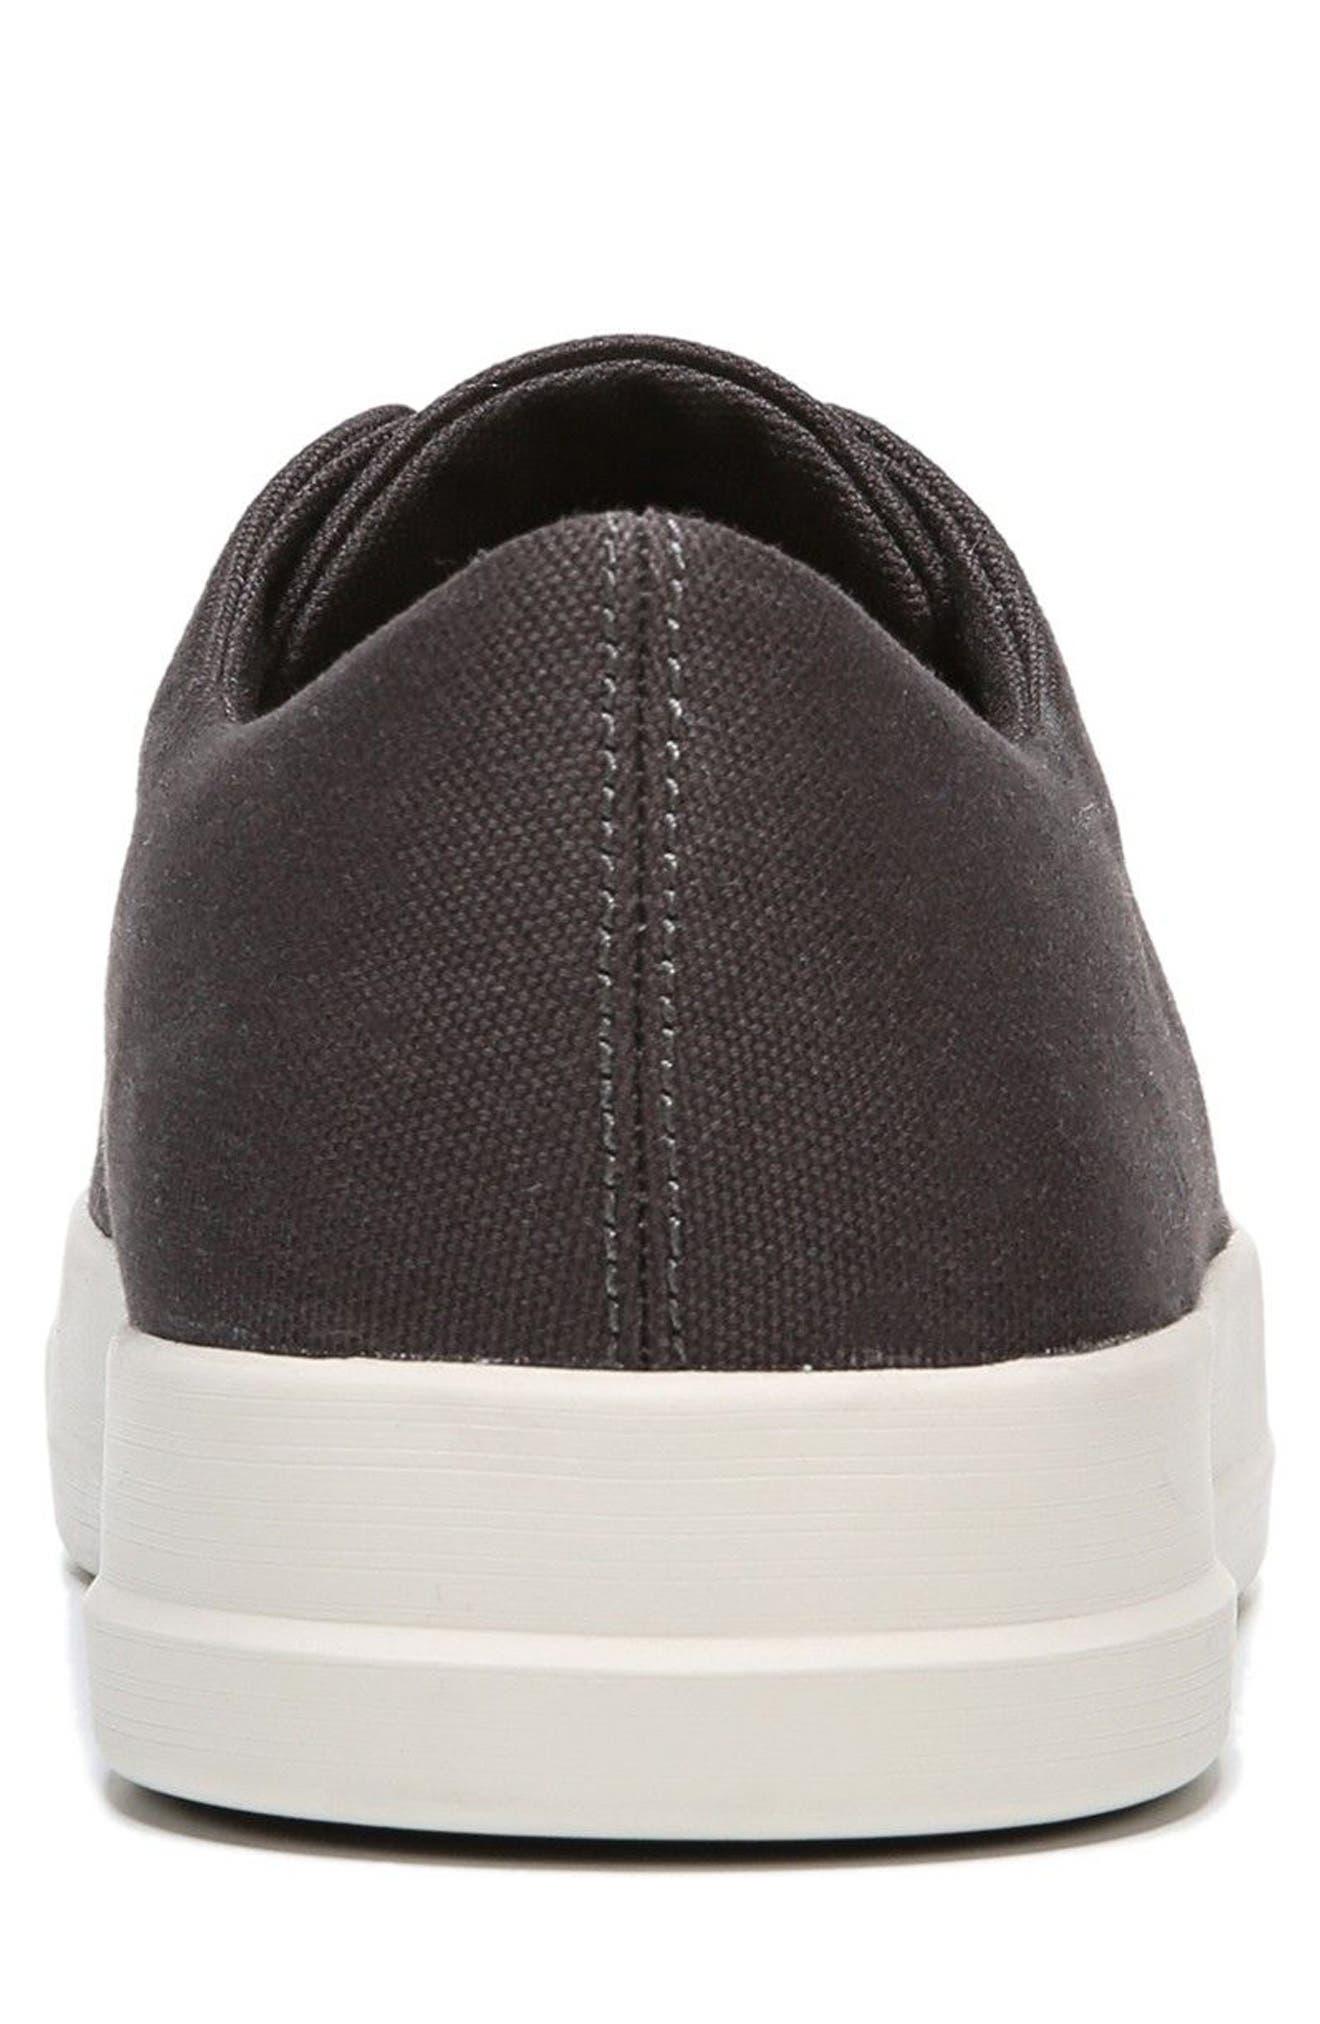 ,                             Copeland Sneaker,                             Alternate thumbnail 35, color,                             021